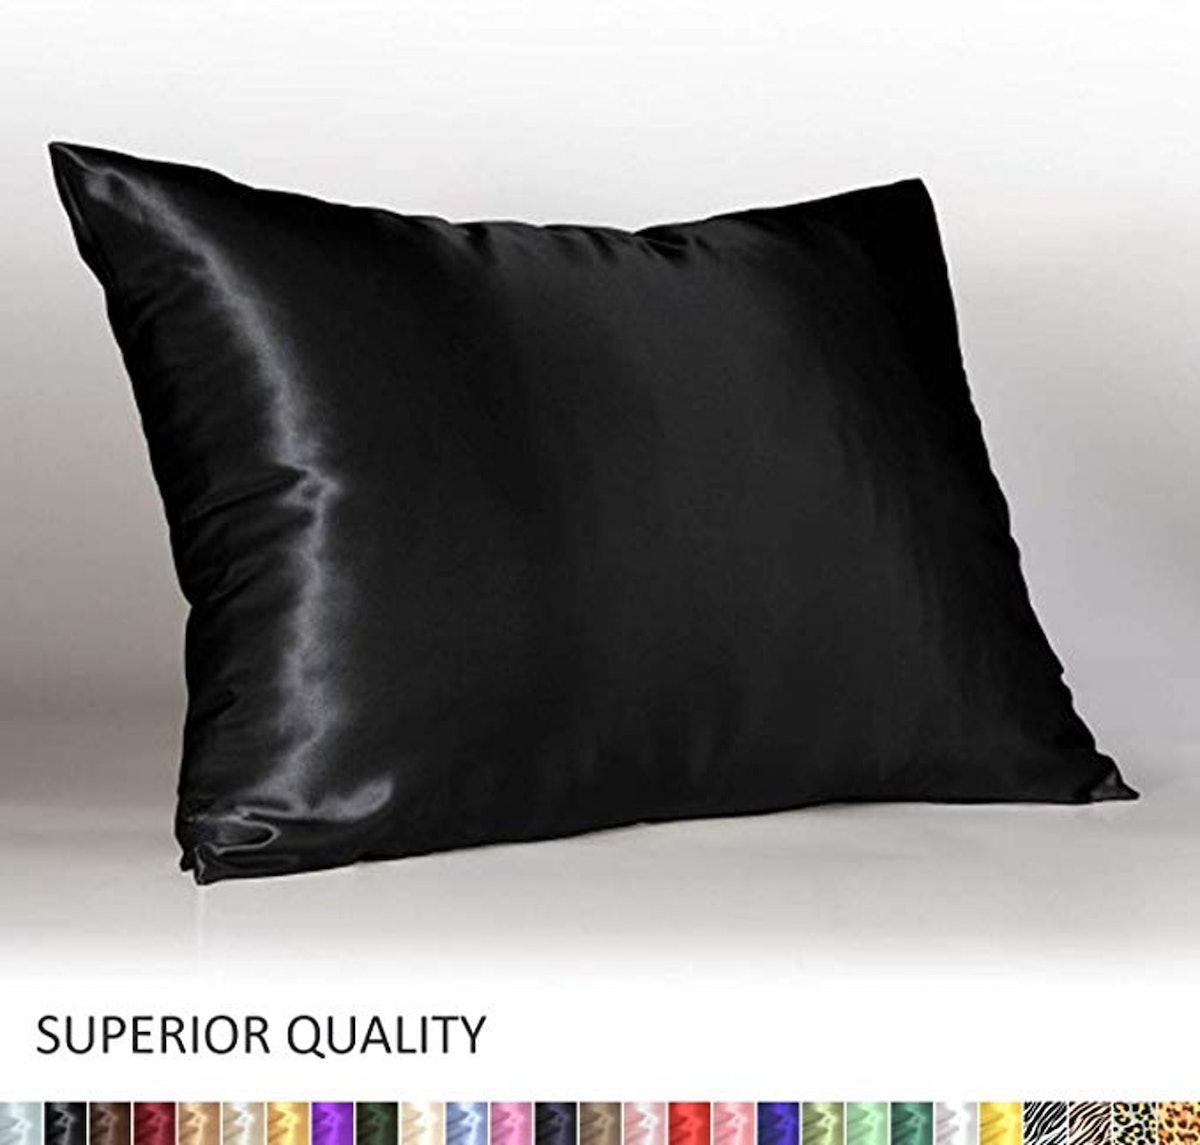 ShopBedding Luxury Satin Pillowcase for Hair